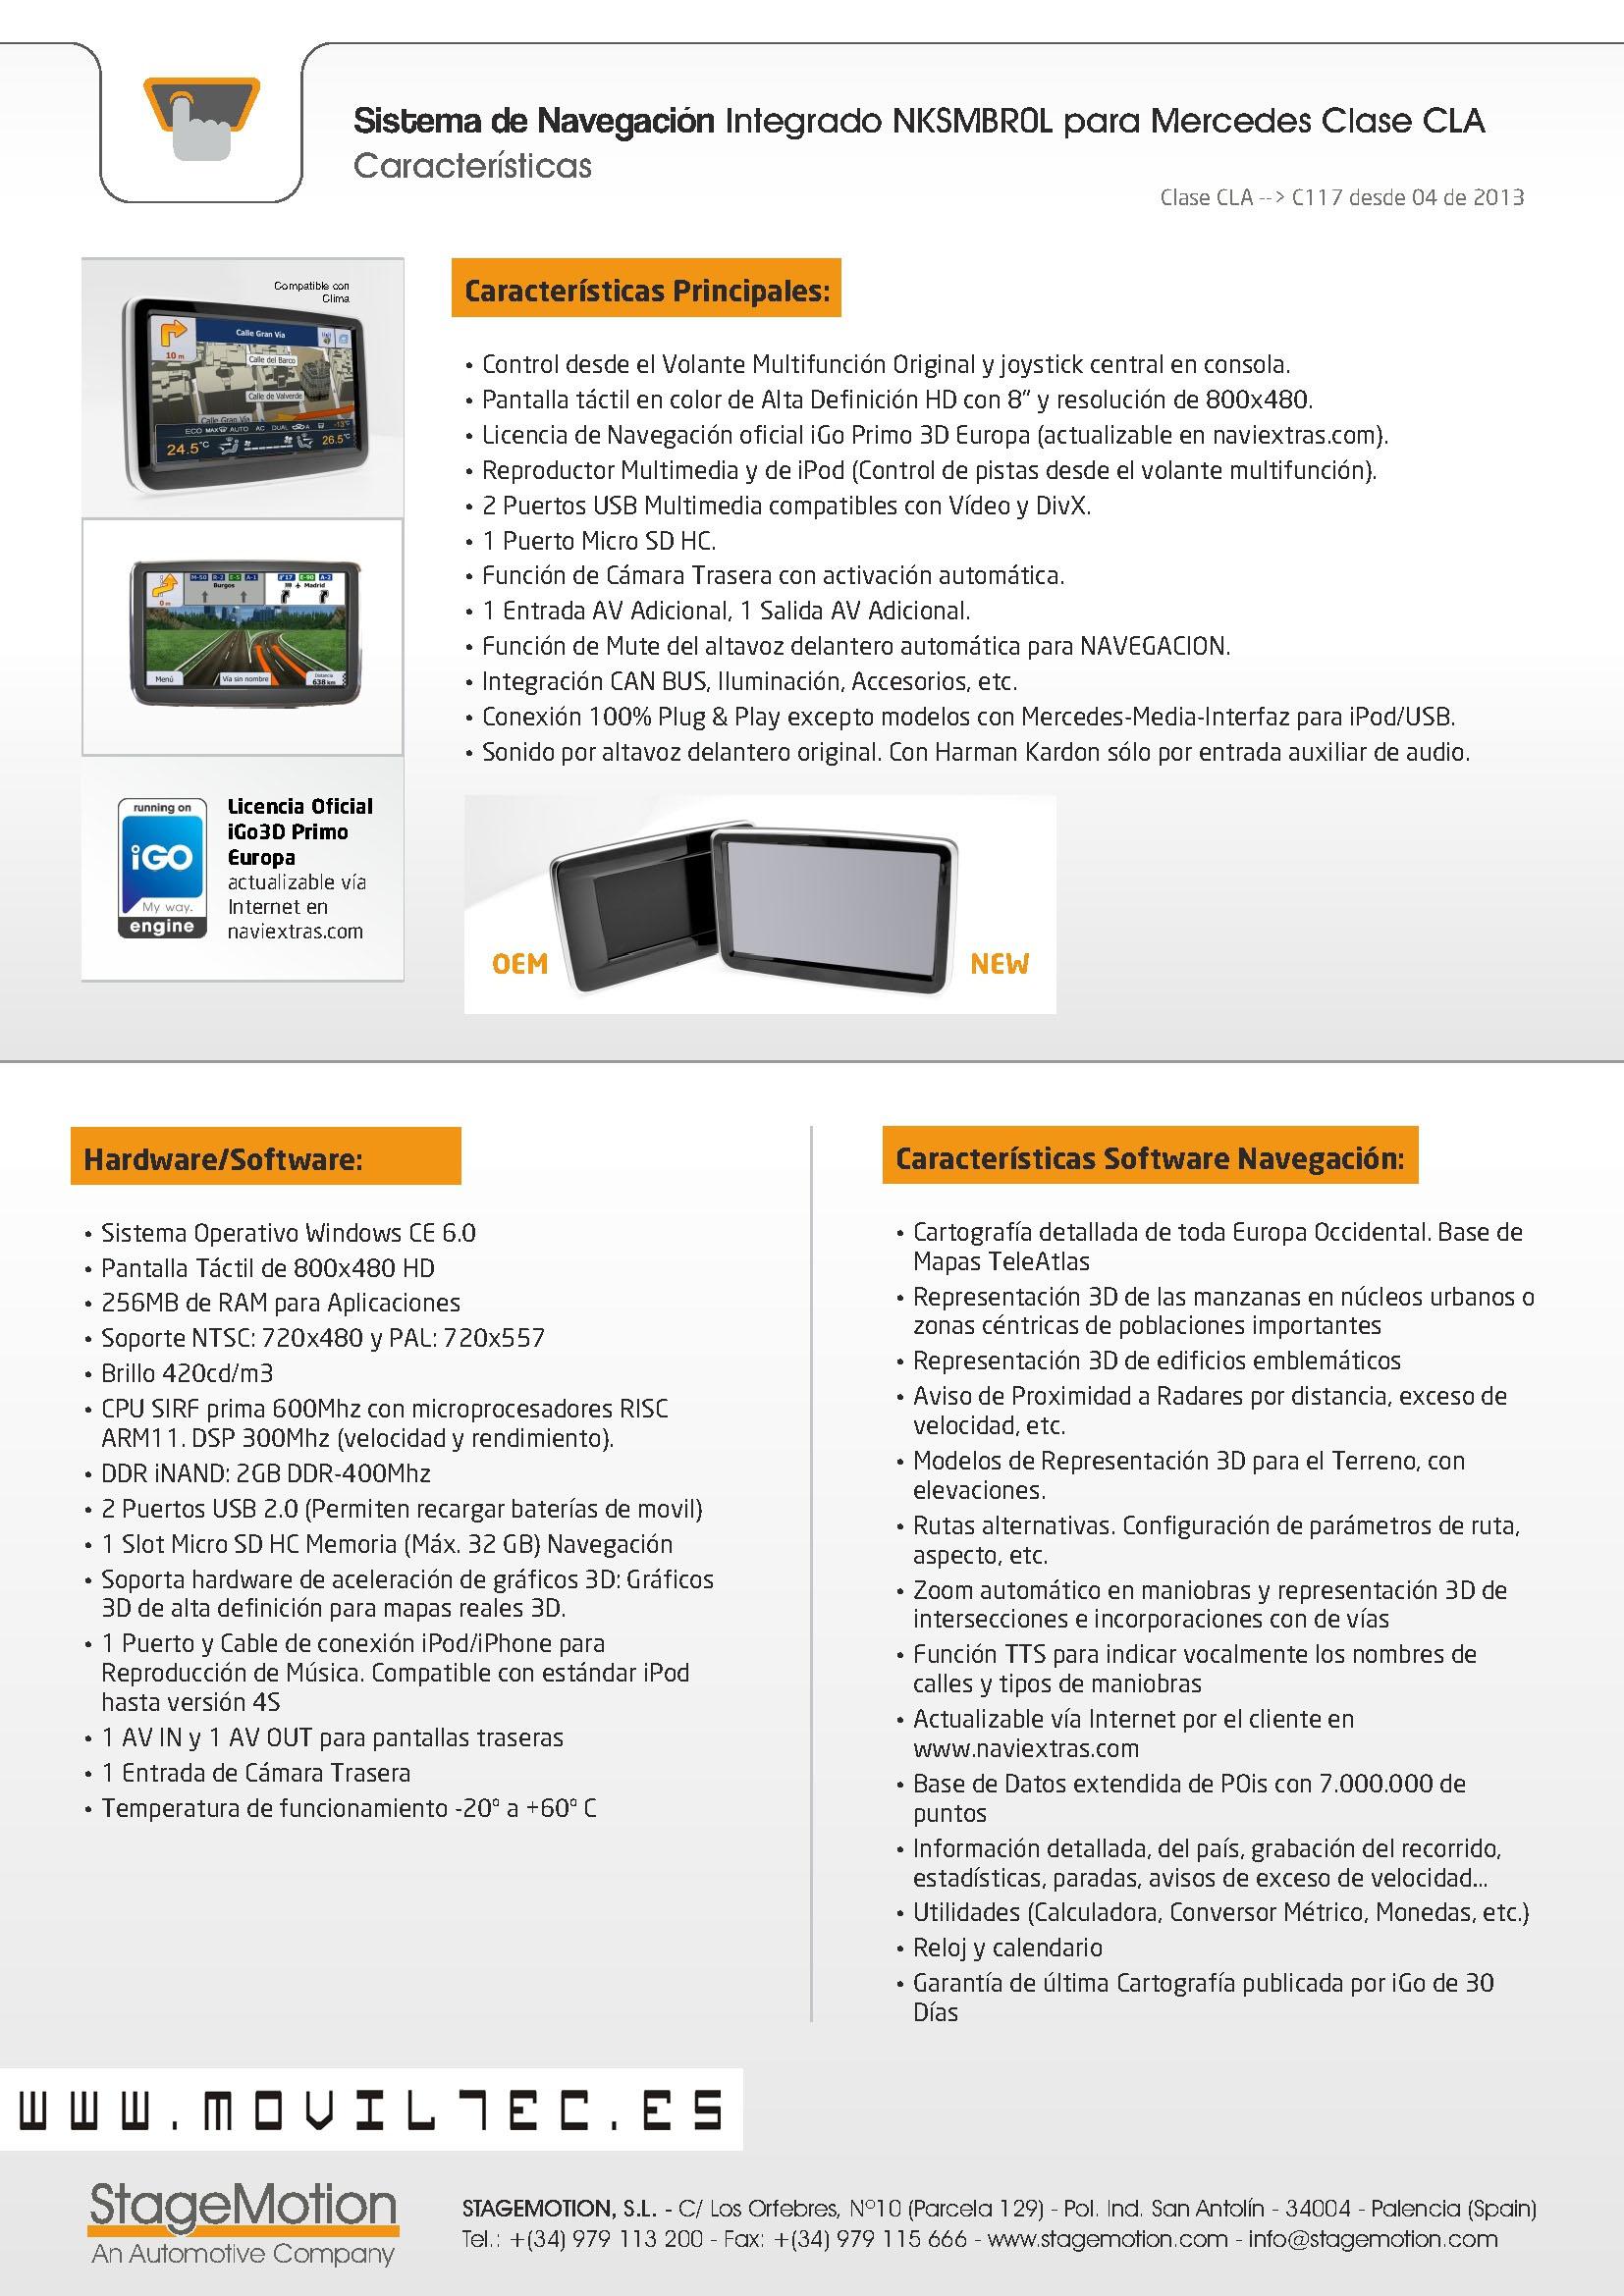 Accesorios-automóvil-Moviltec-Sevilla-Navegacion-Mercedes-Clase-CLA